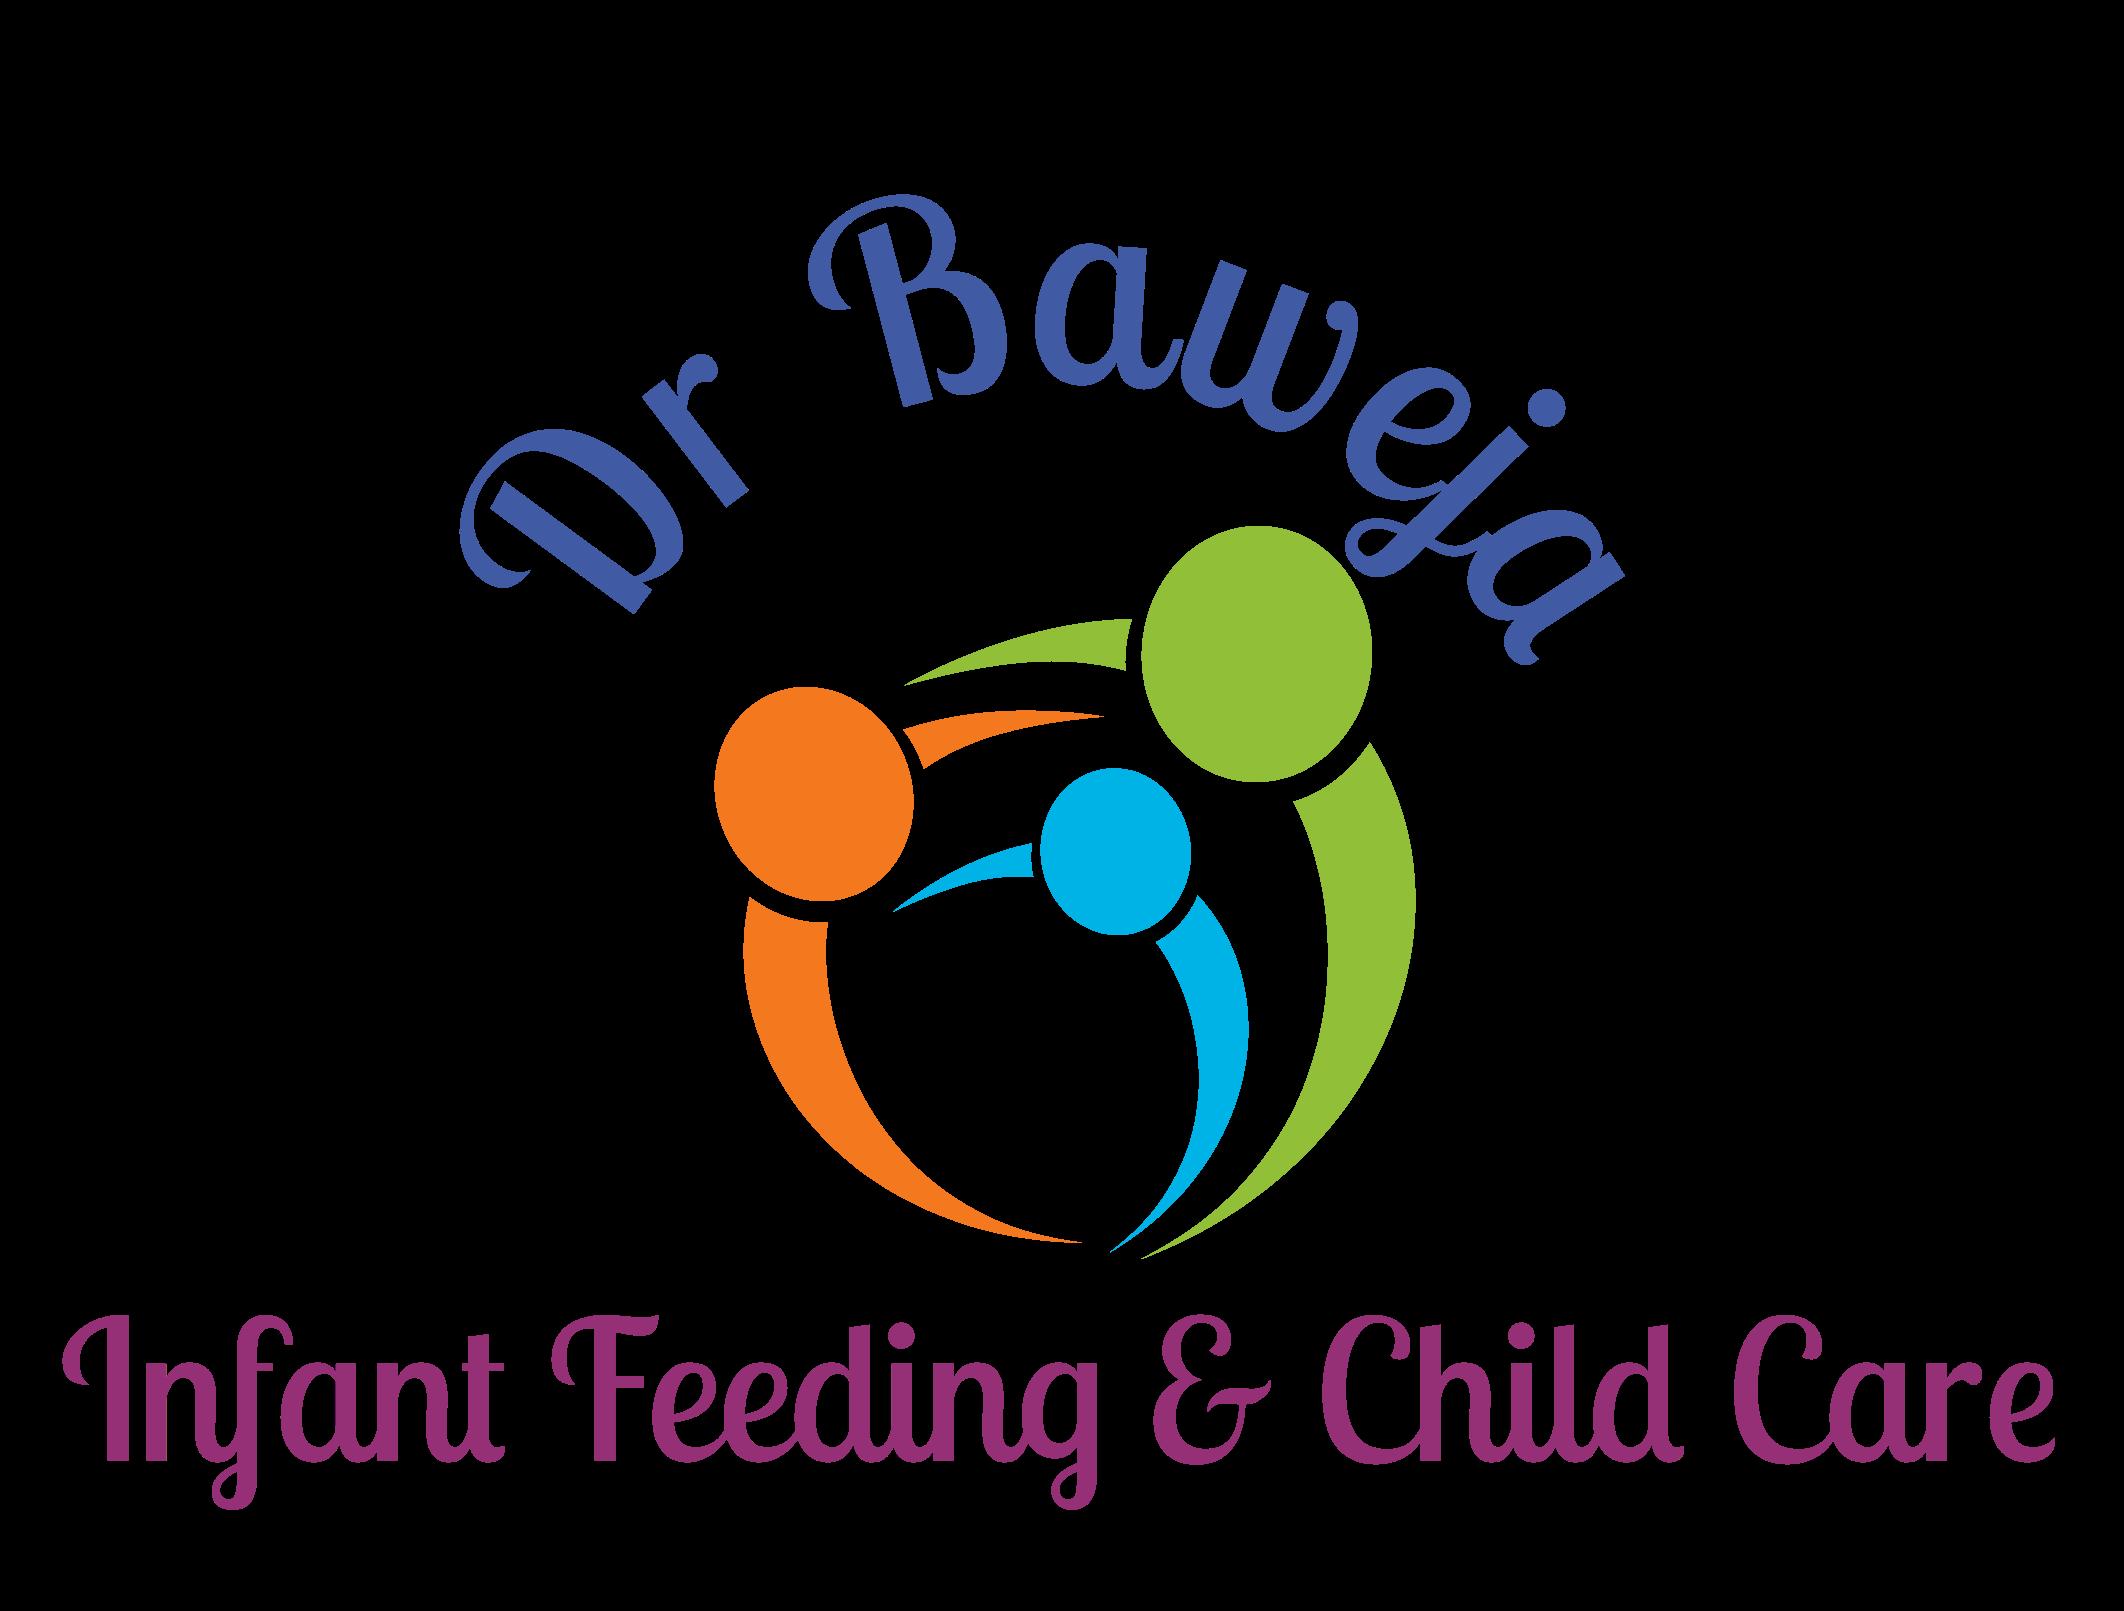 Dr Shacchee Baweja & Dr Vipul Baweja